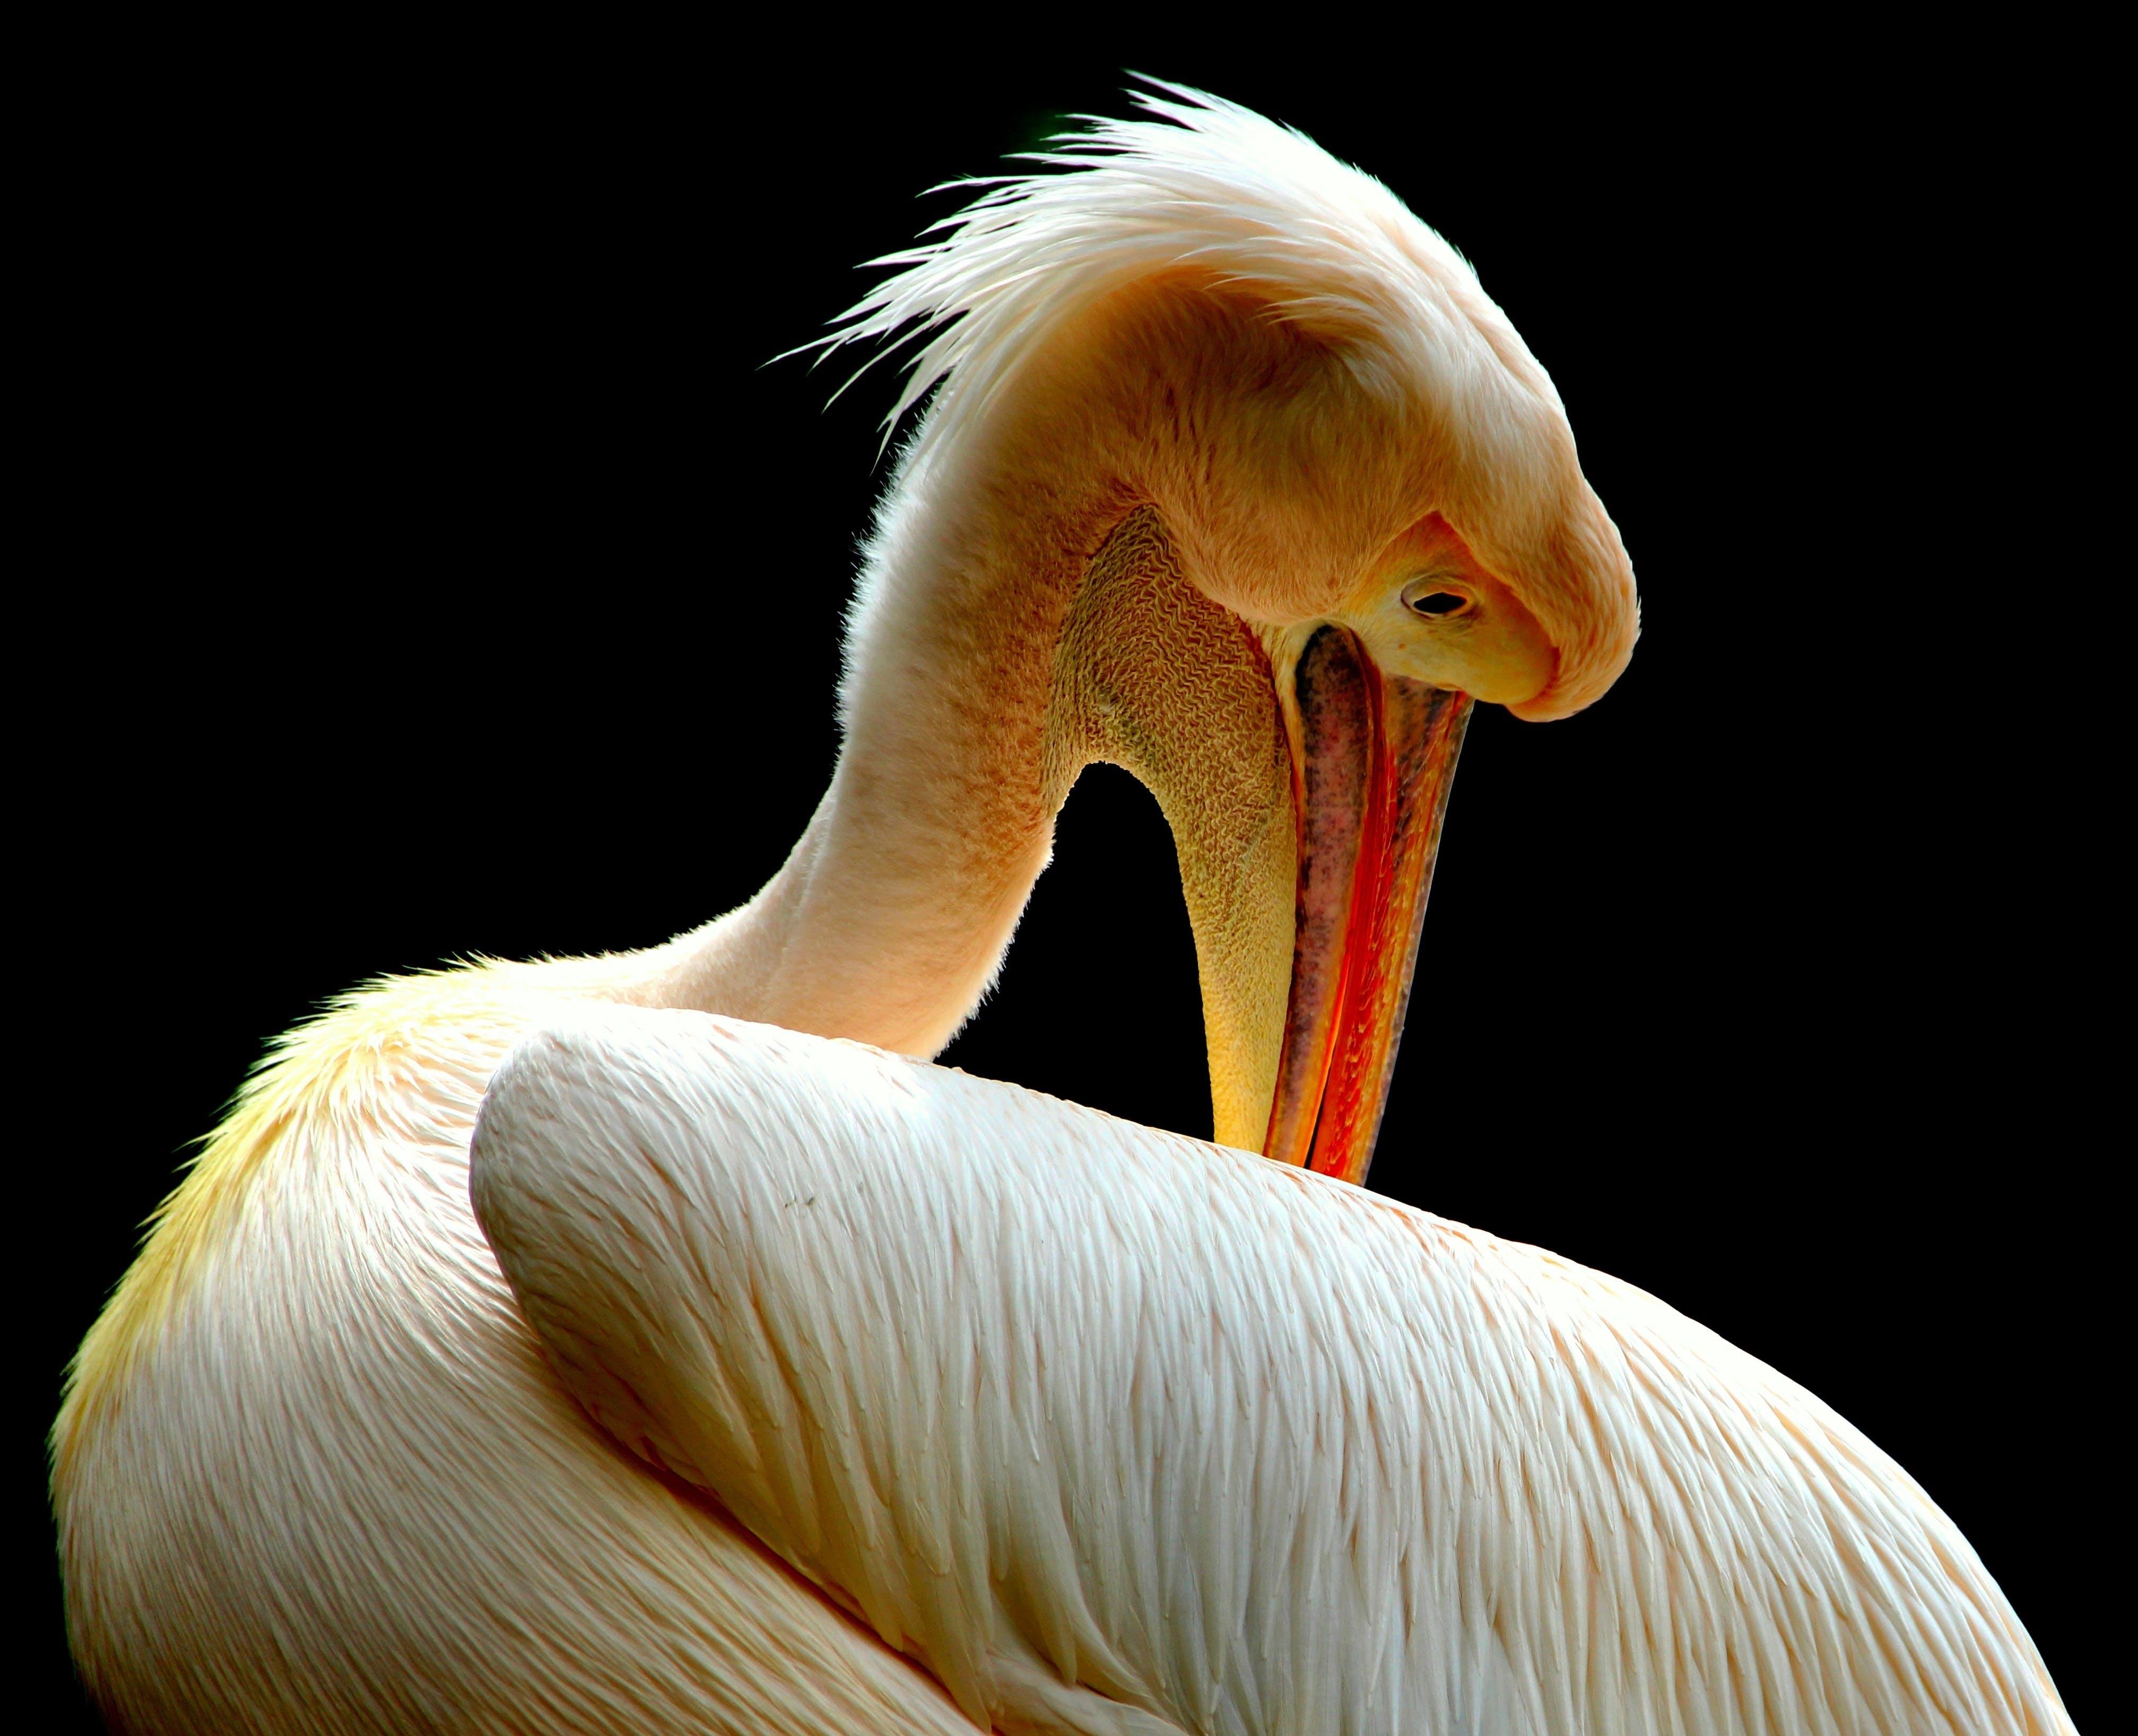 Free stock photo of bird, pelican, animal, beak